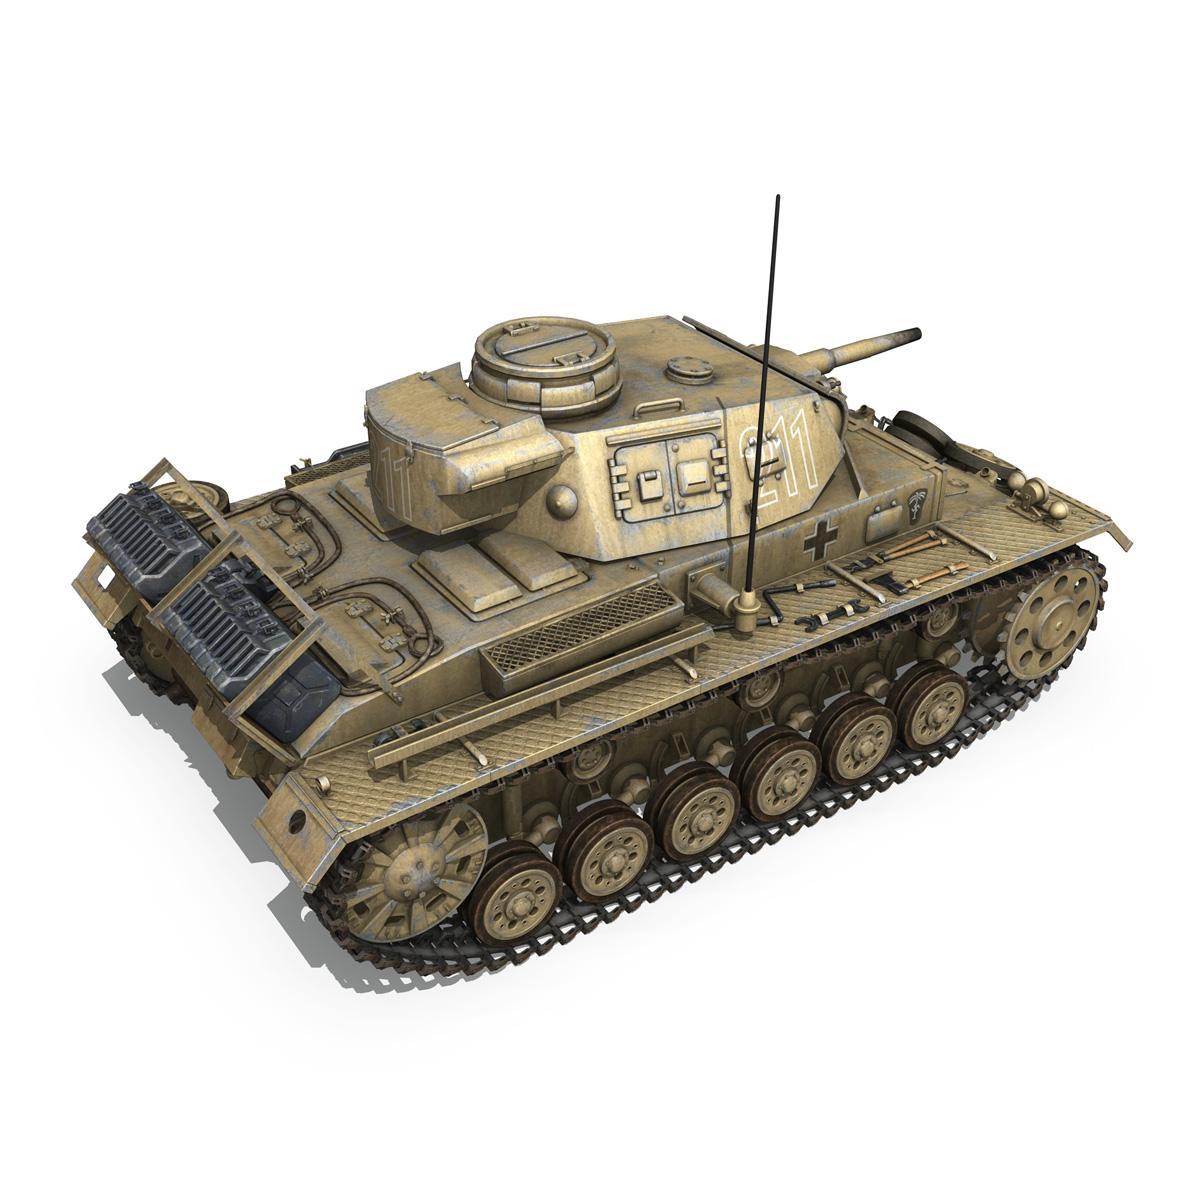 pzkpfw iii – panzer 3 – ausf.g – dak – 211 3d model 3ds c4d fbx lwo lw lws obj 266468